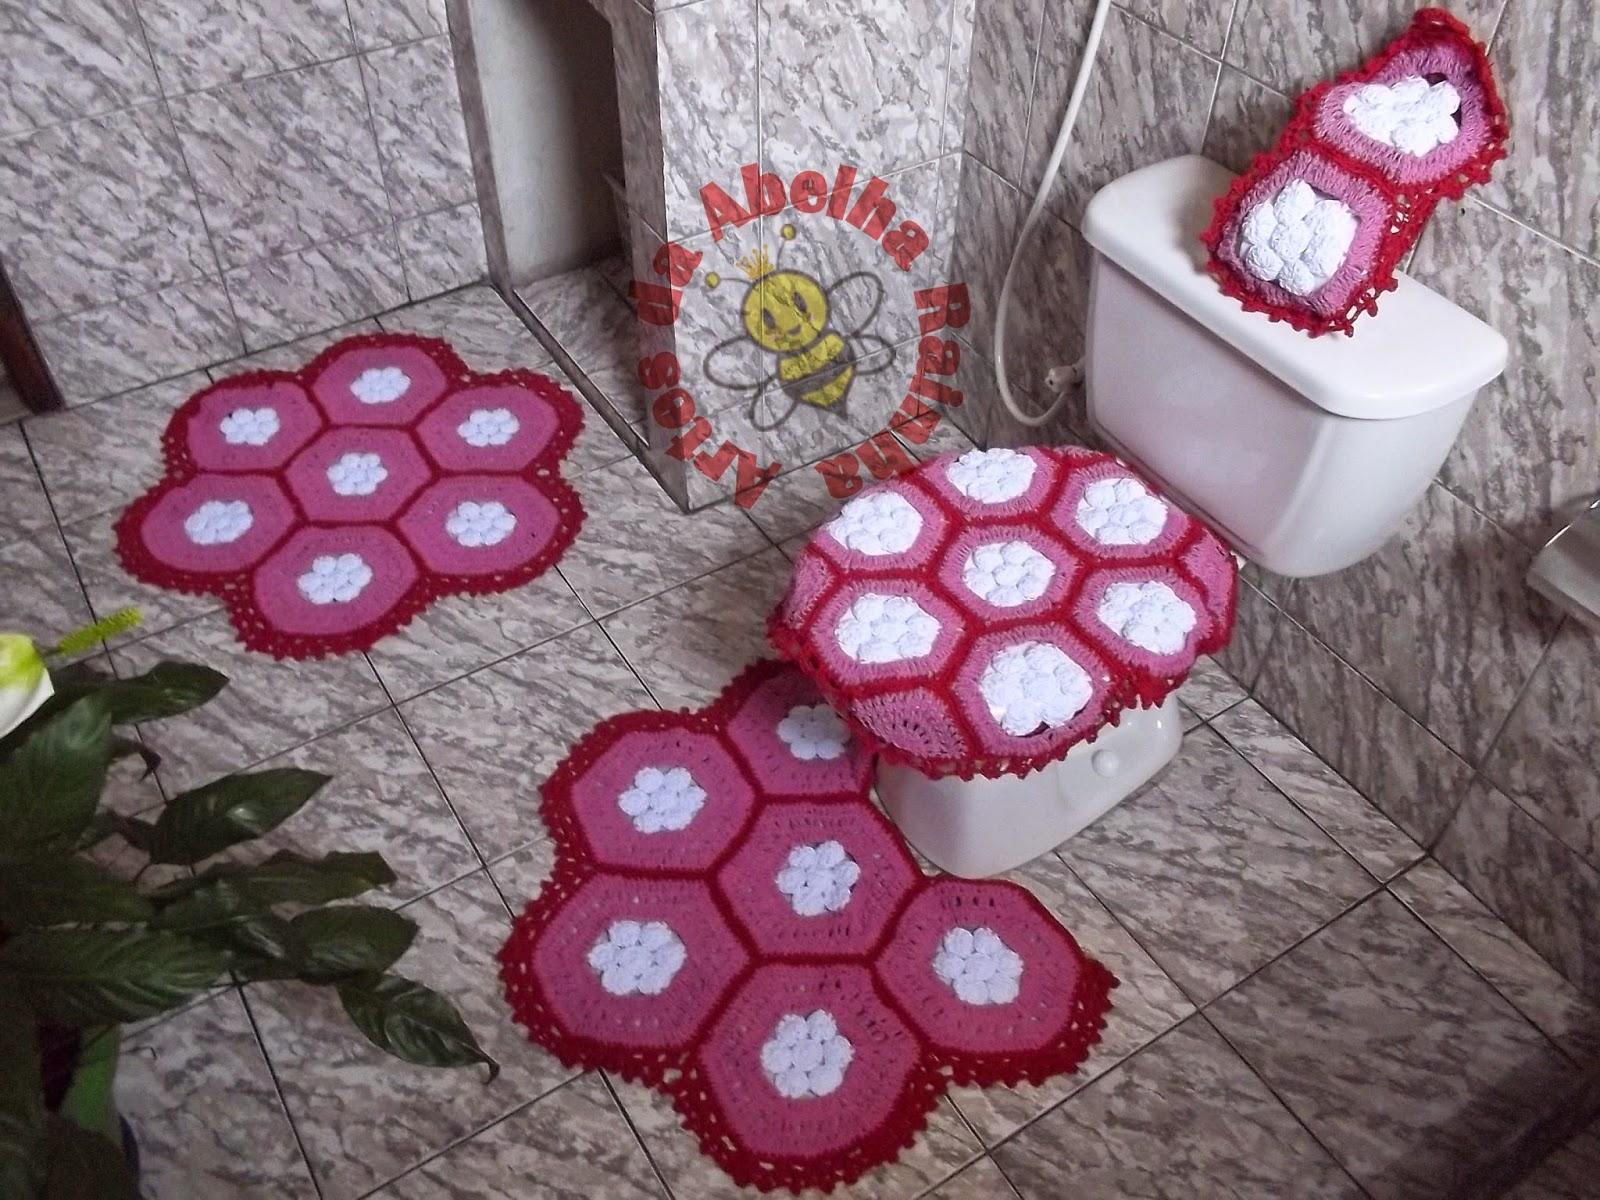 Top Cozinha Banheiro Croche Tattoo Tattoos In Lists For Pinterest #6E2E3D 1600 1200